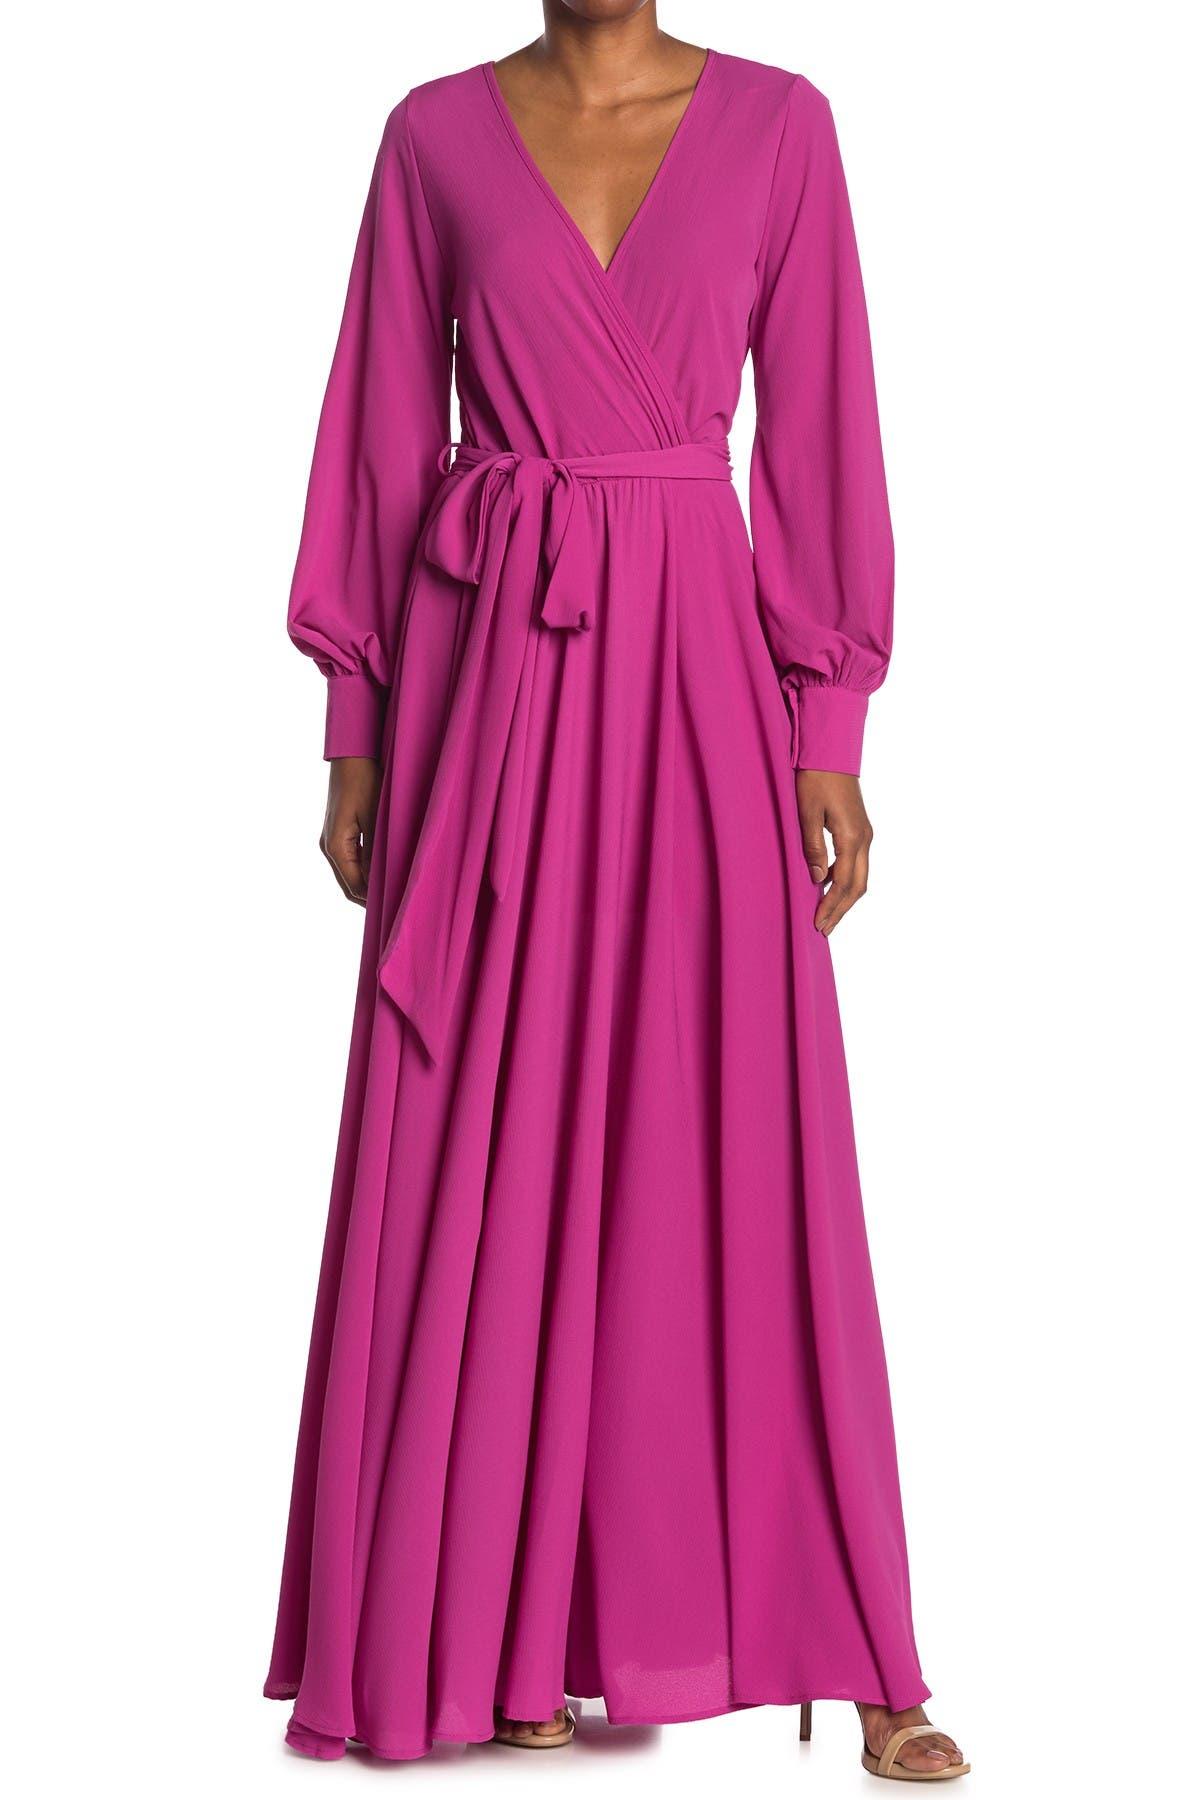 Image of Meghan LA LilyPad Maxi Dress